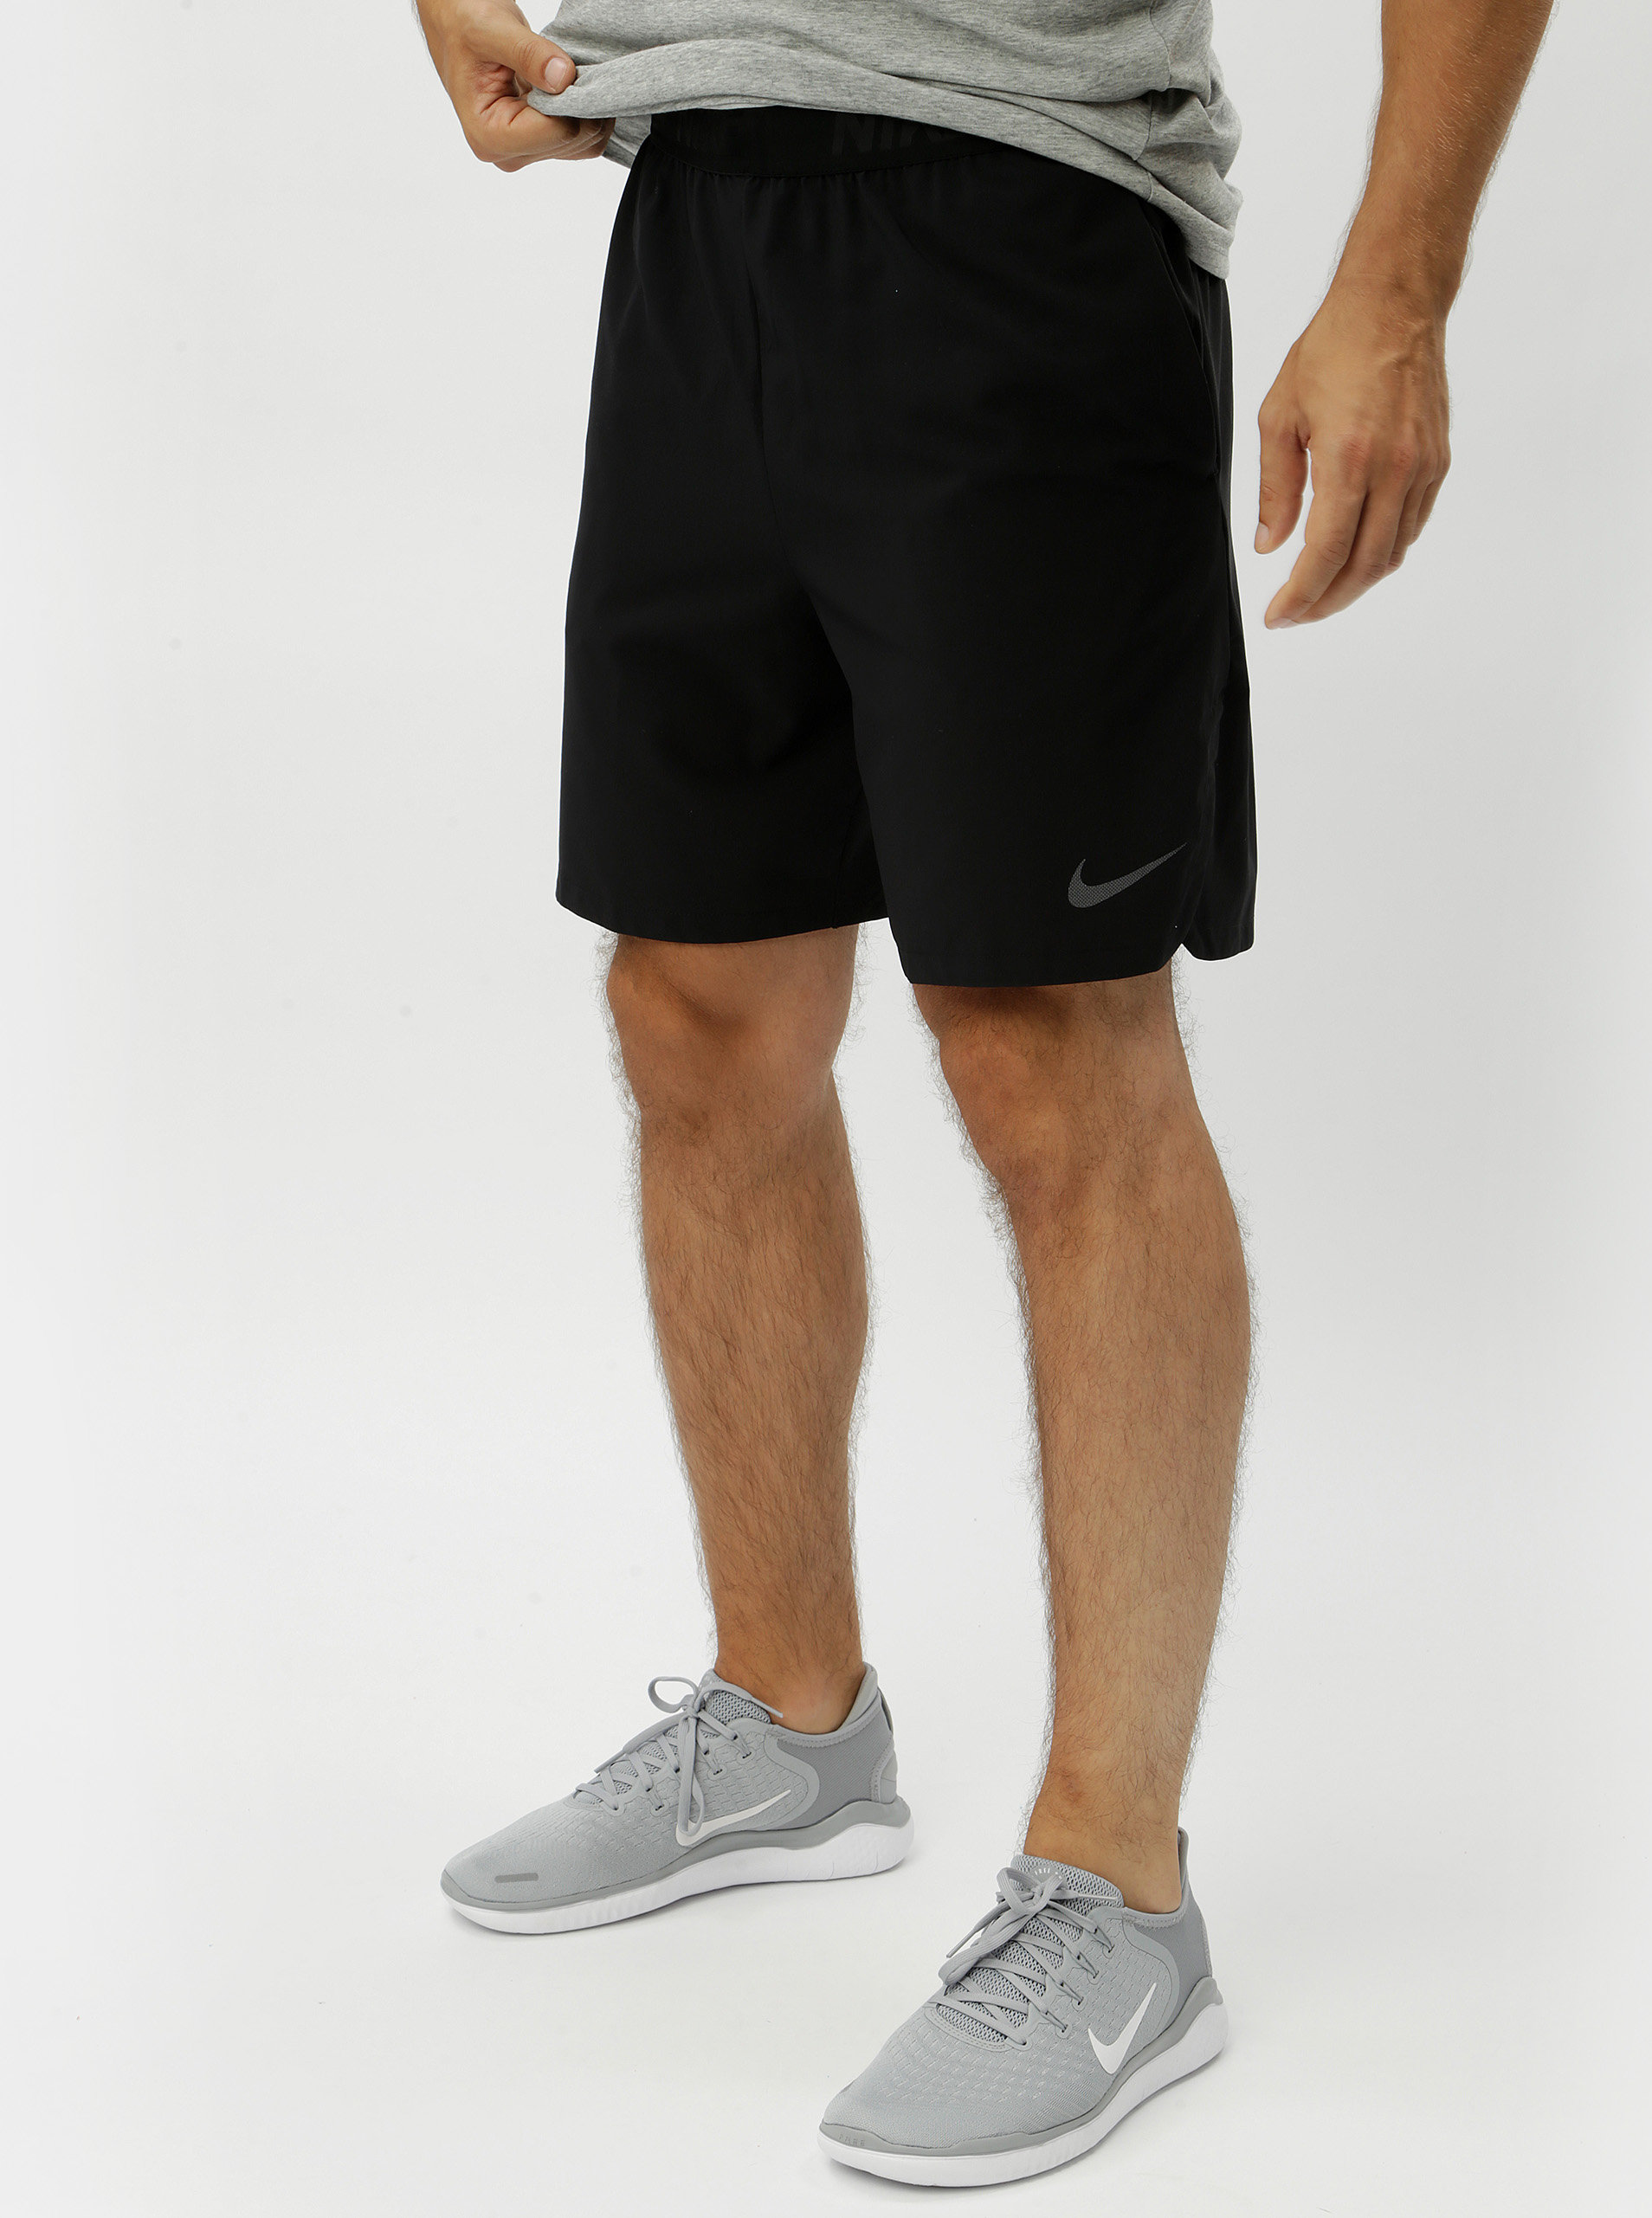 Černé pánské sportovní kraťasy s kapsami Nike ... 196b13b7cb